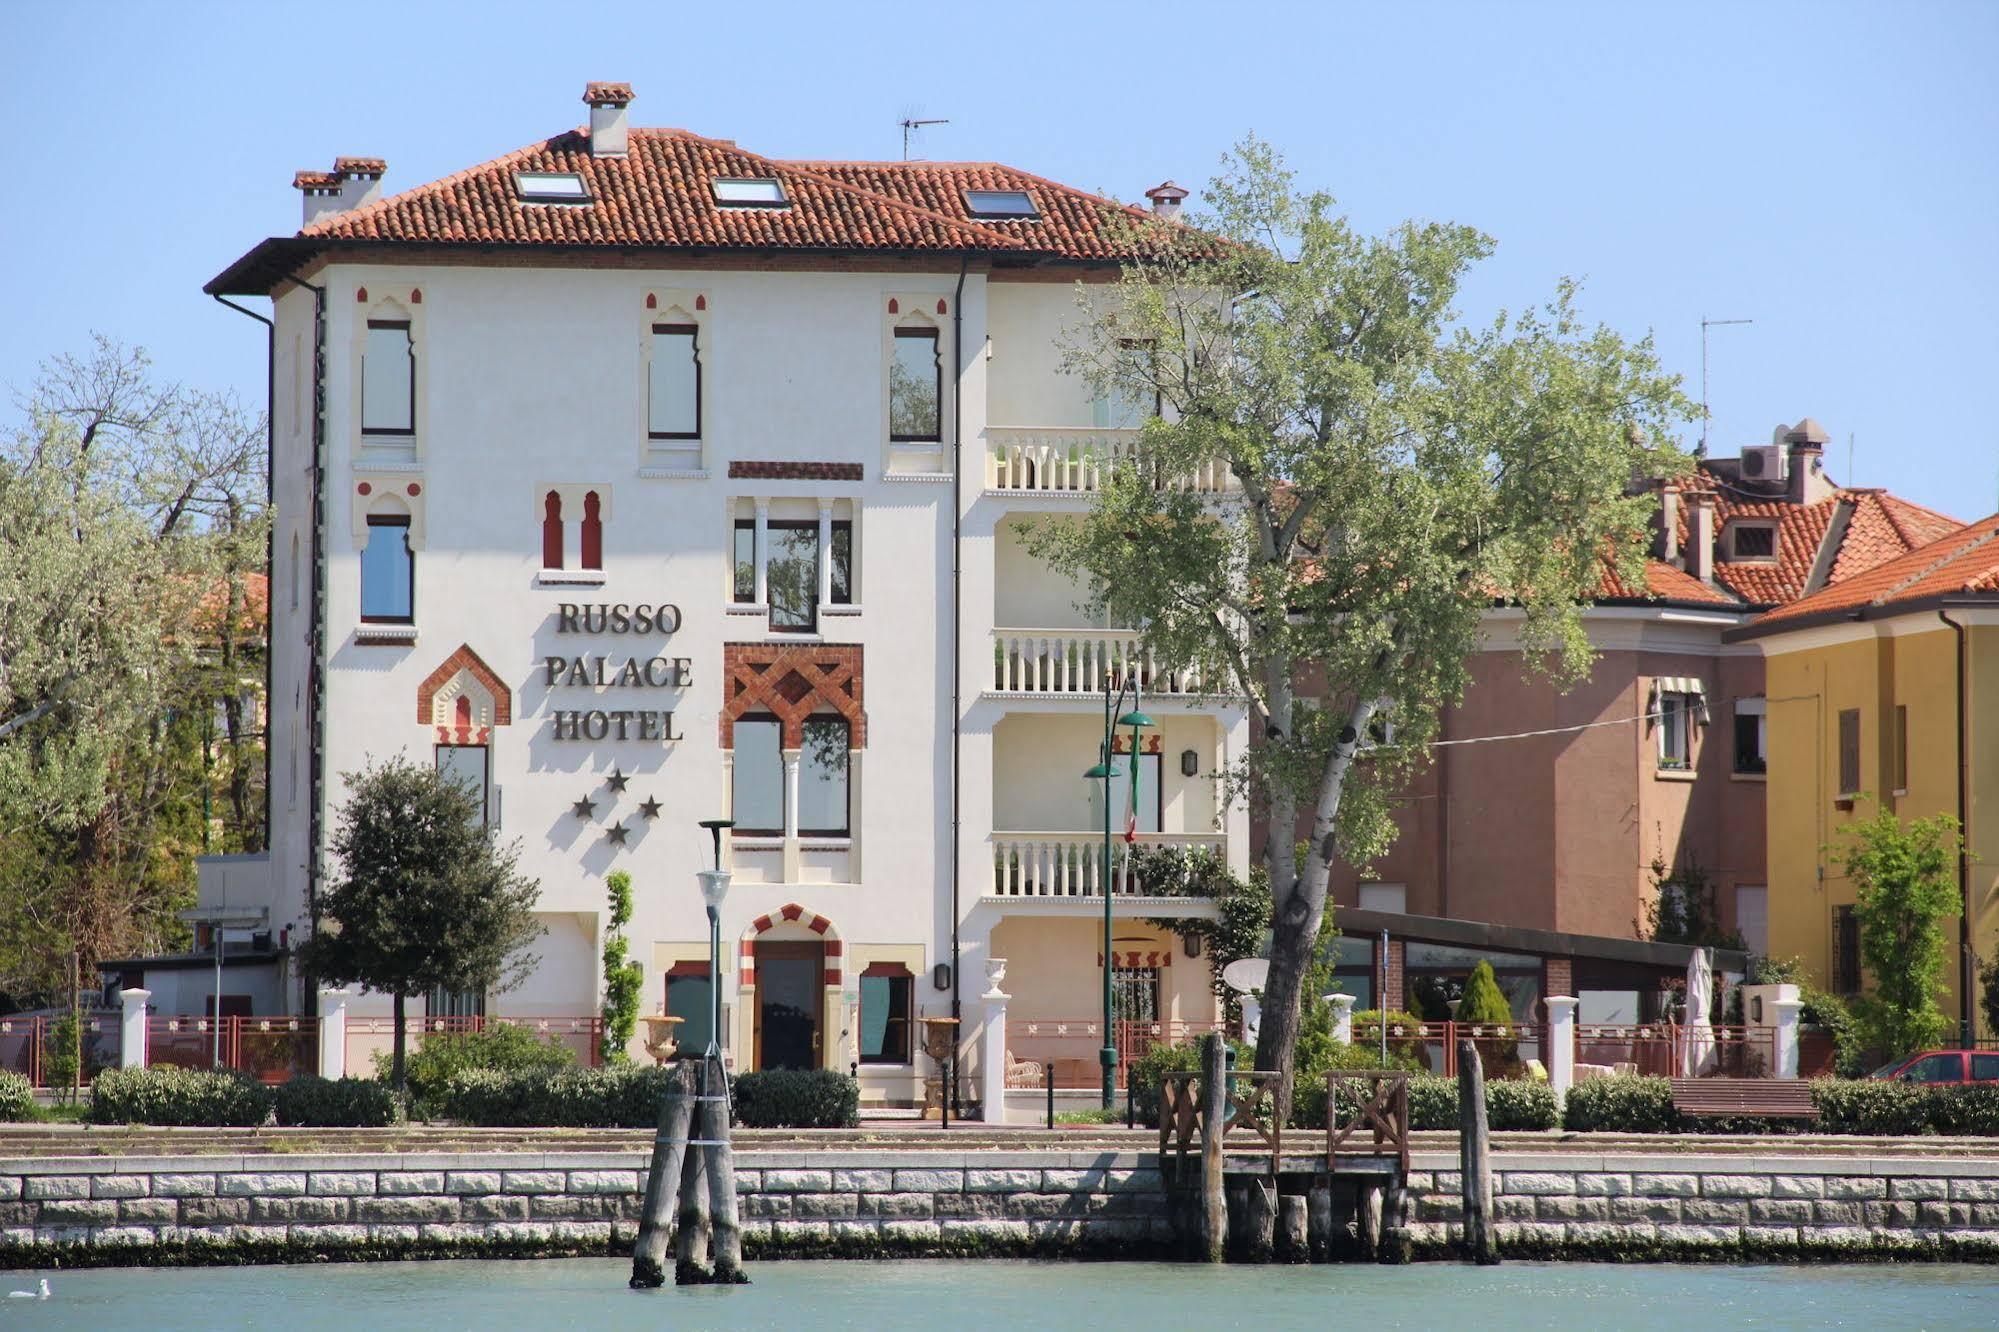 Romantik Hotel Russo Palace